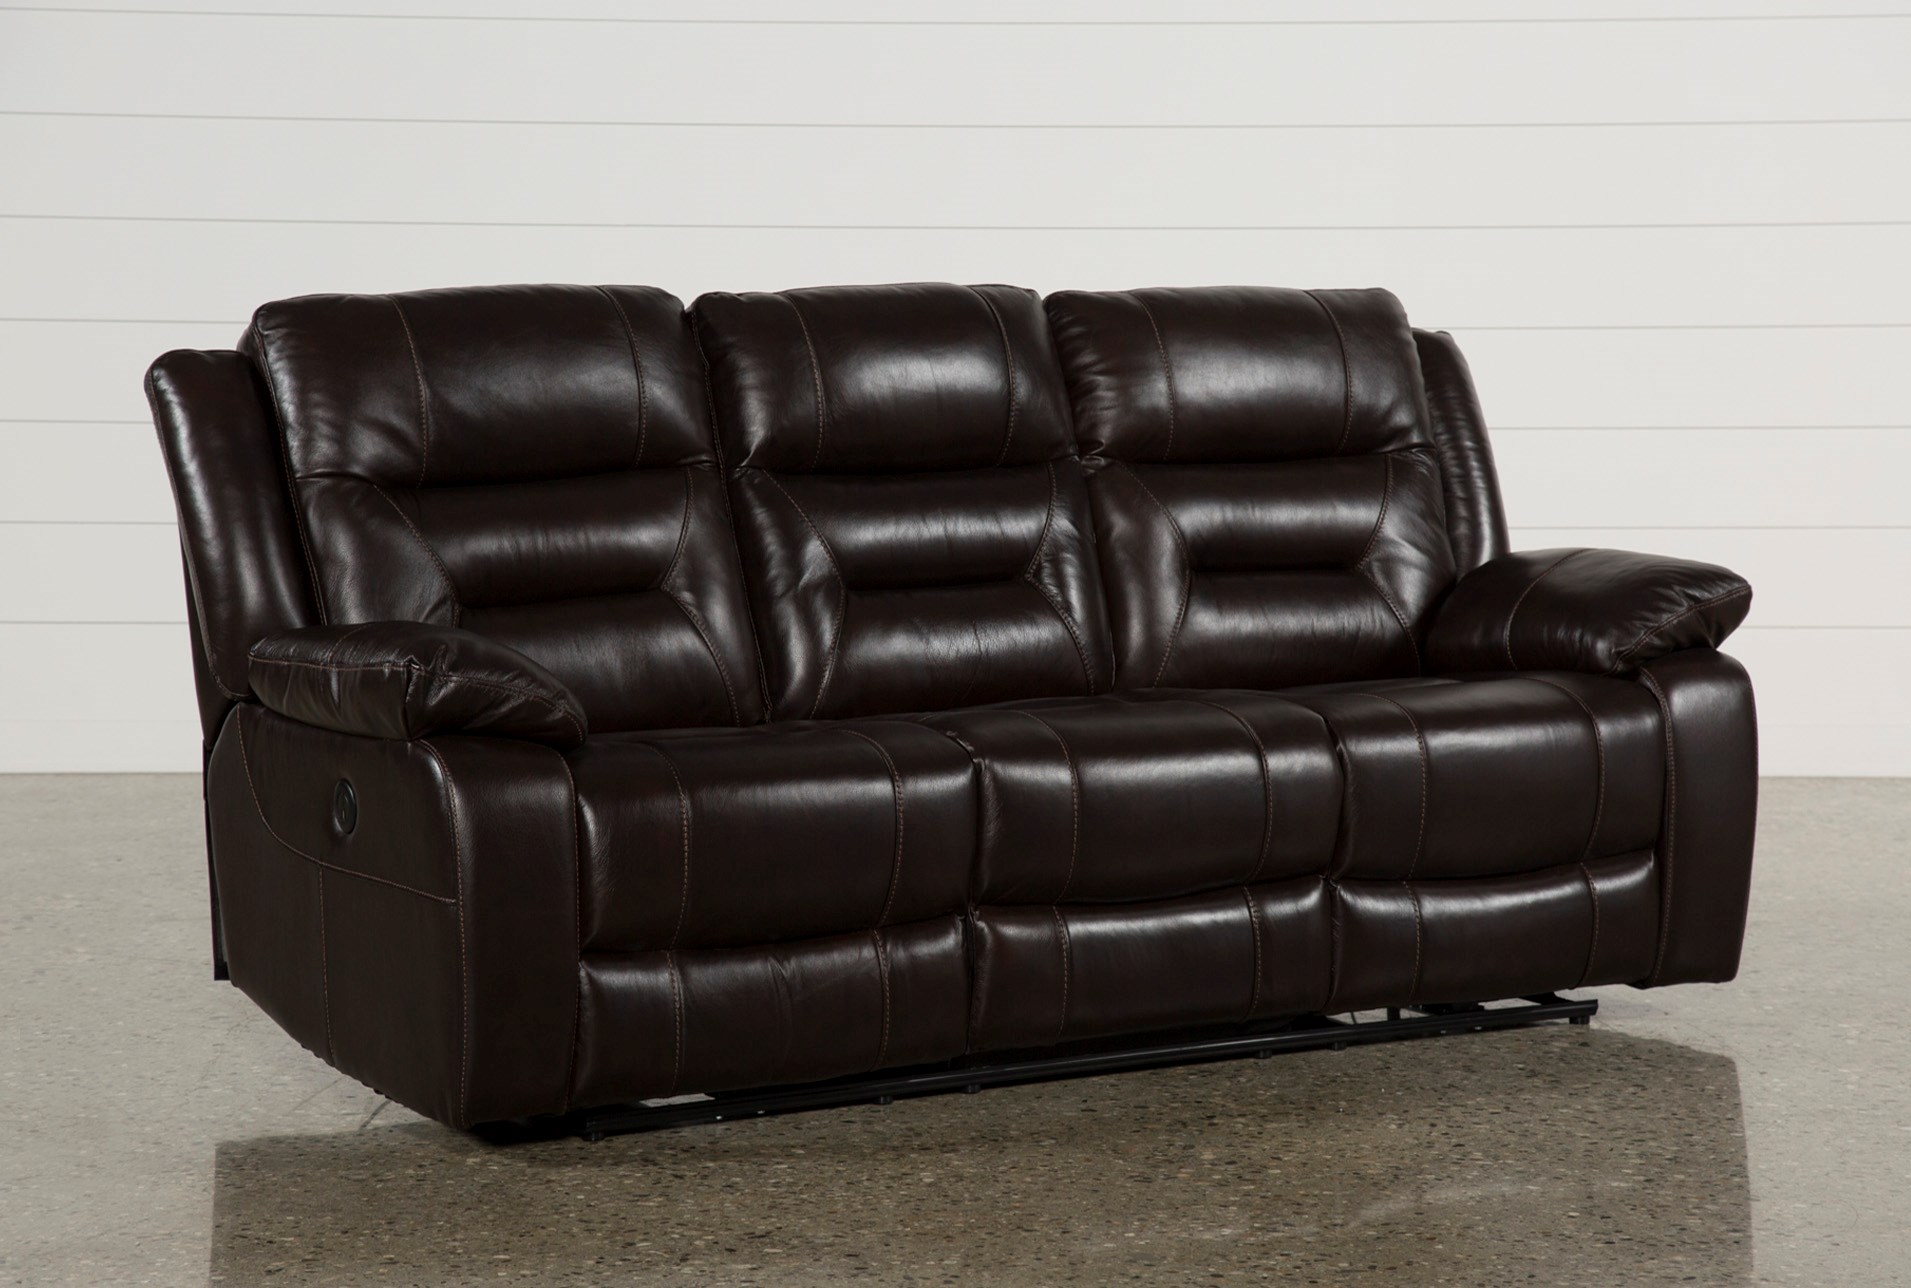 Wayne Ii Leather Power Reclining Sofa W Usb Living Spaces ~ Motorized Reclining Sofa